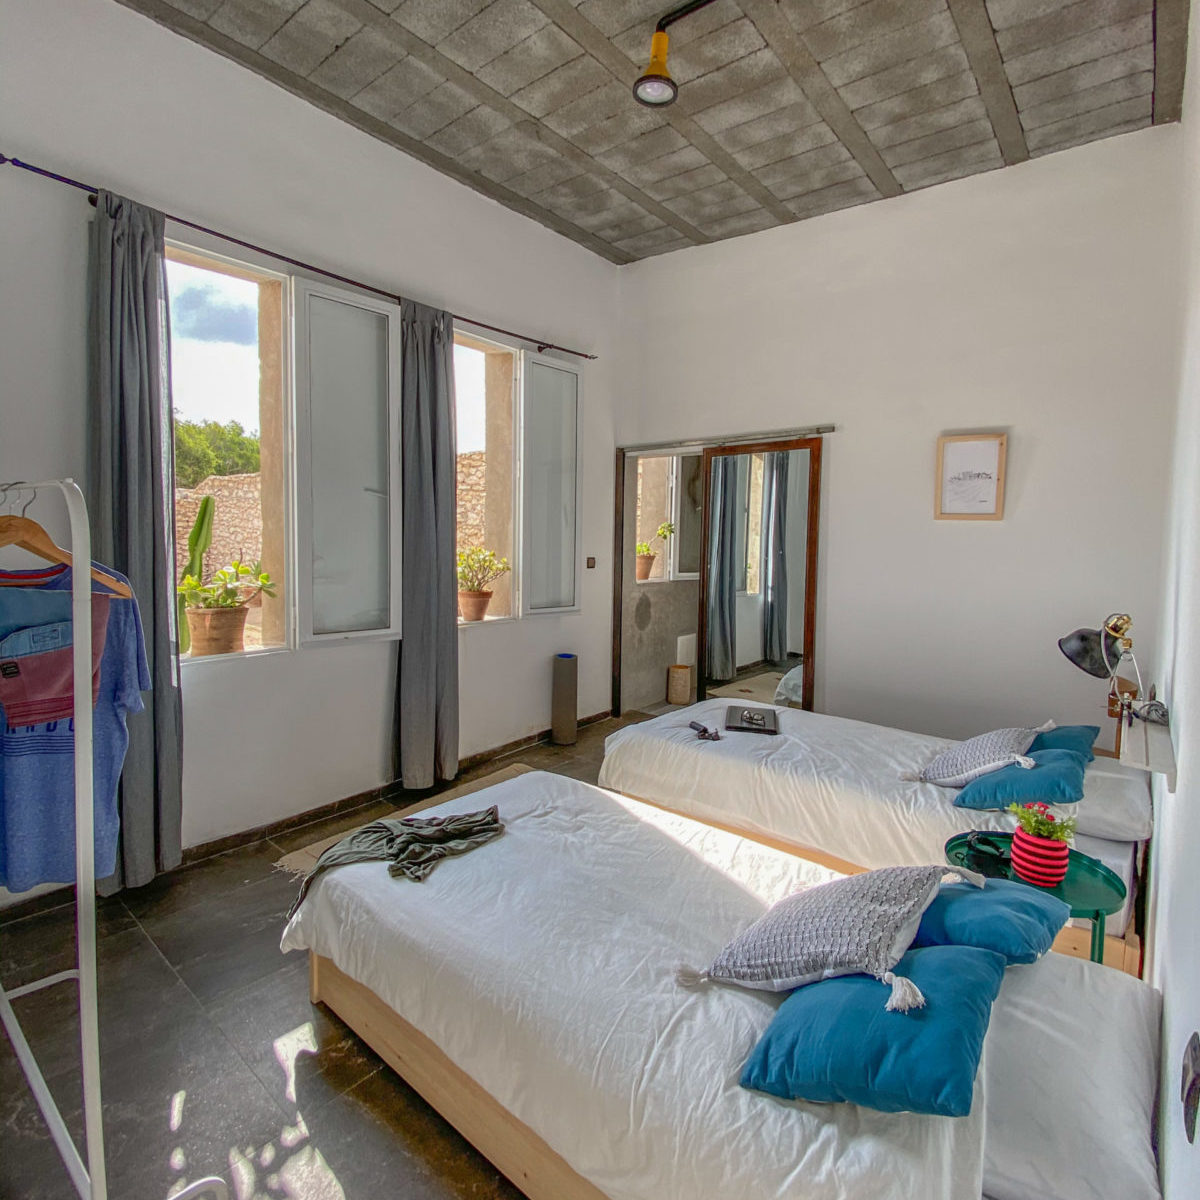 Twin bed room Lovingsurf house Essaouira